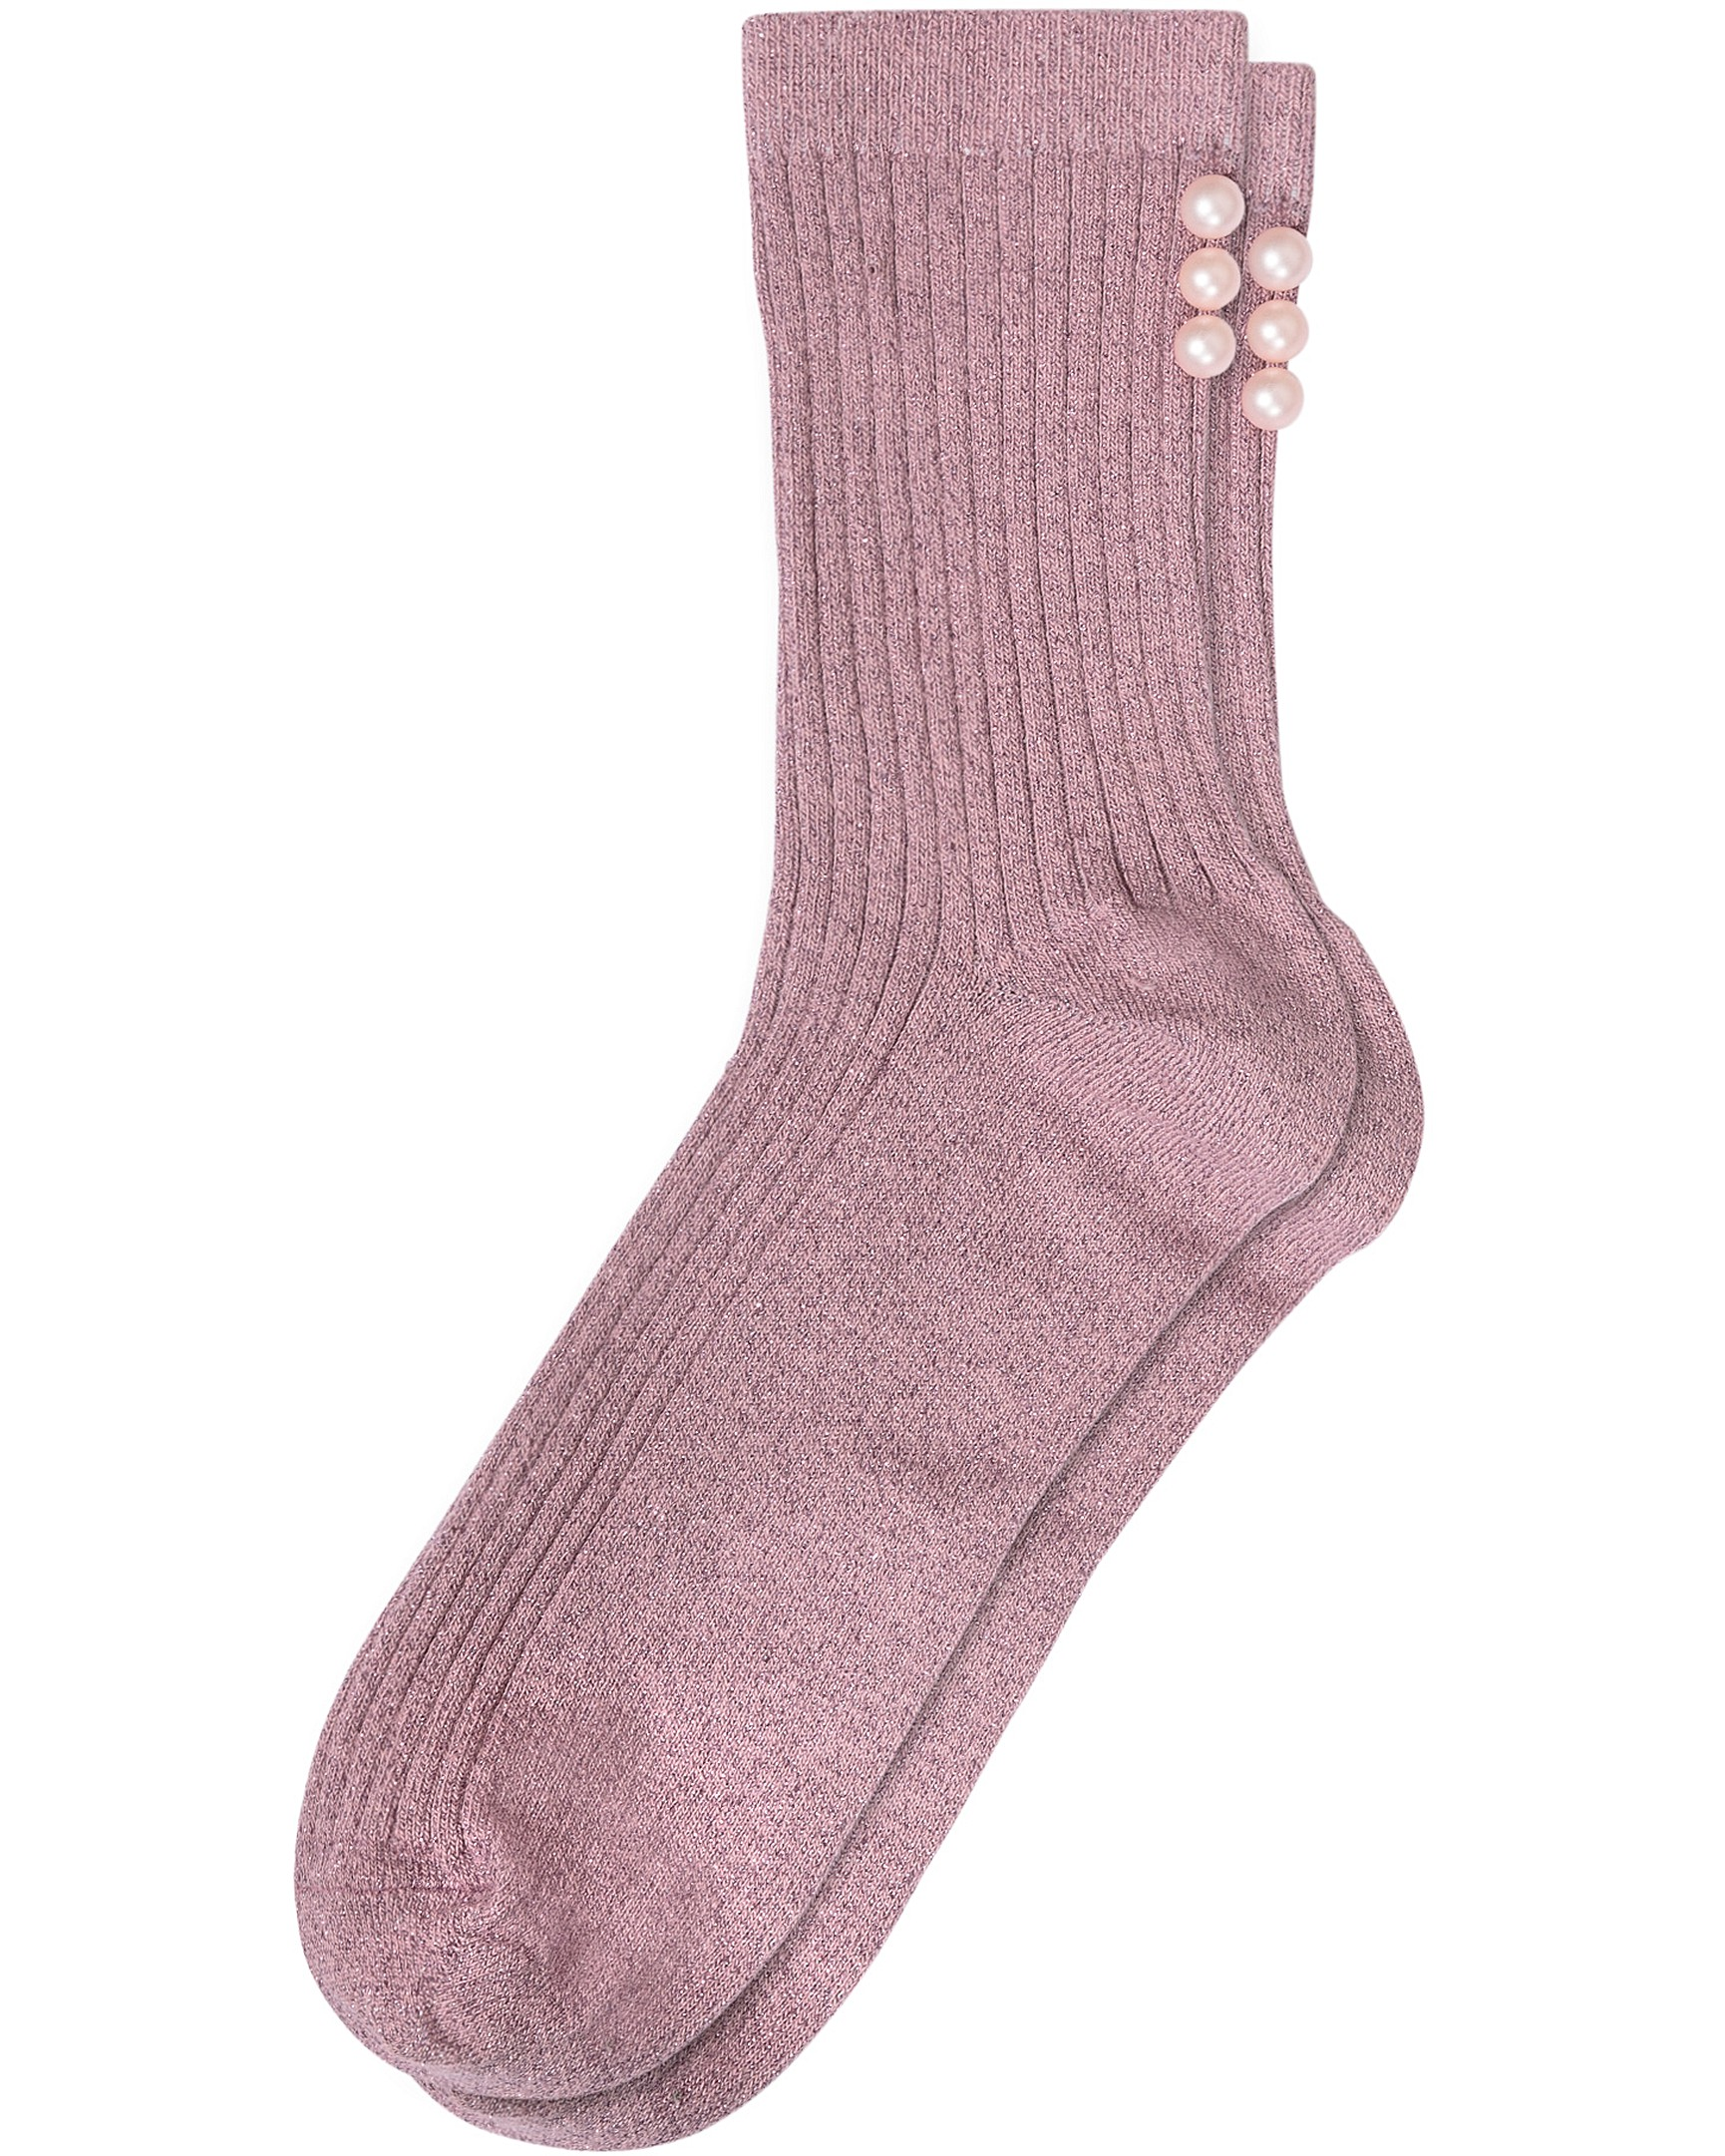 39f61efff4b Pearl Beaded Lilac Shimmer Socks